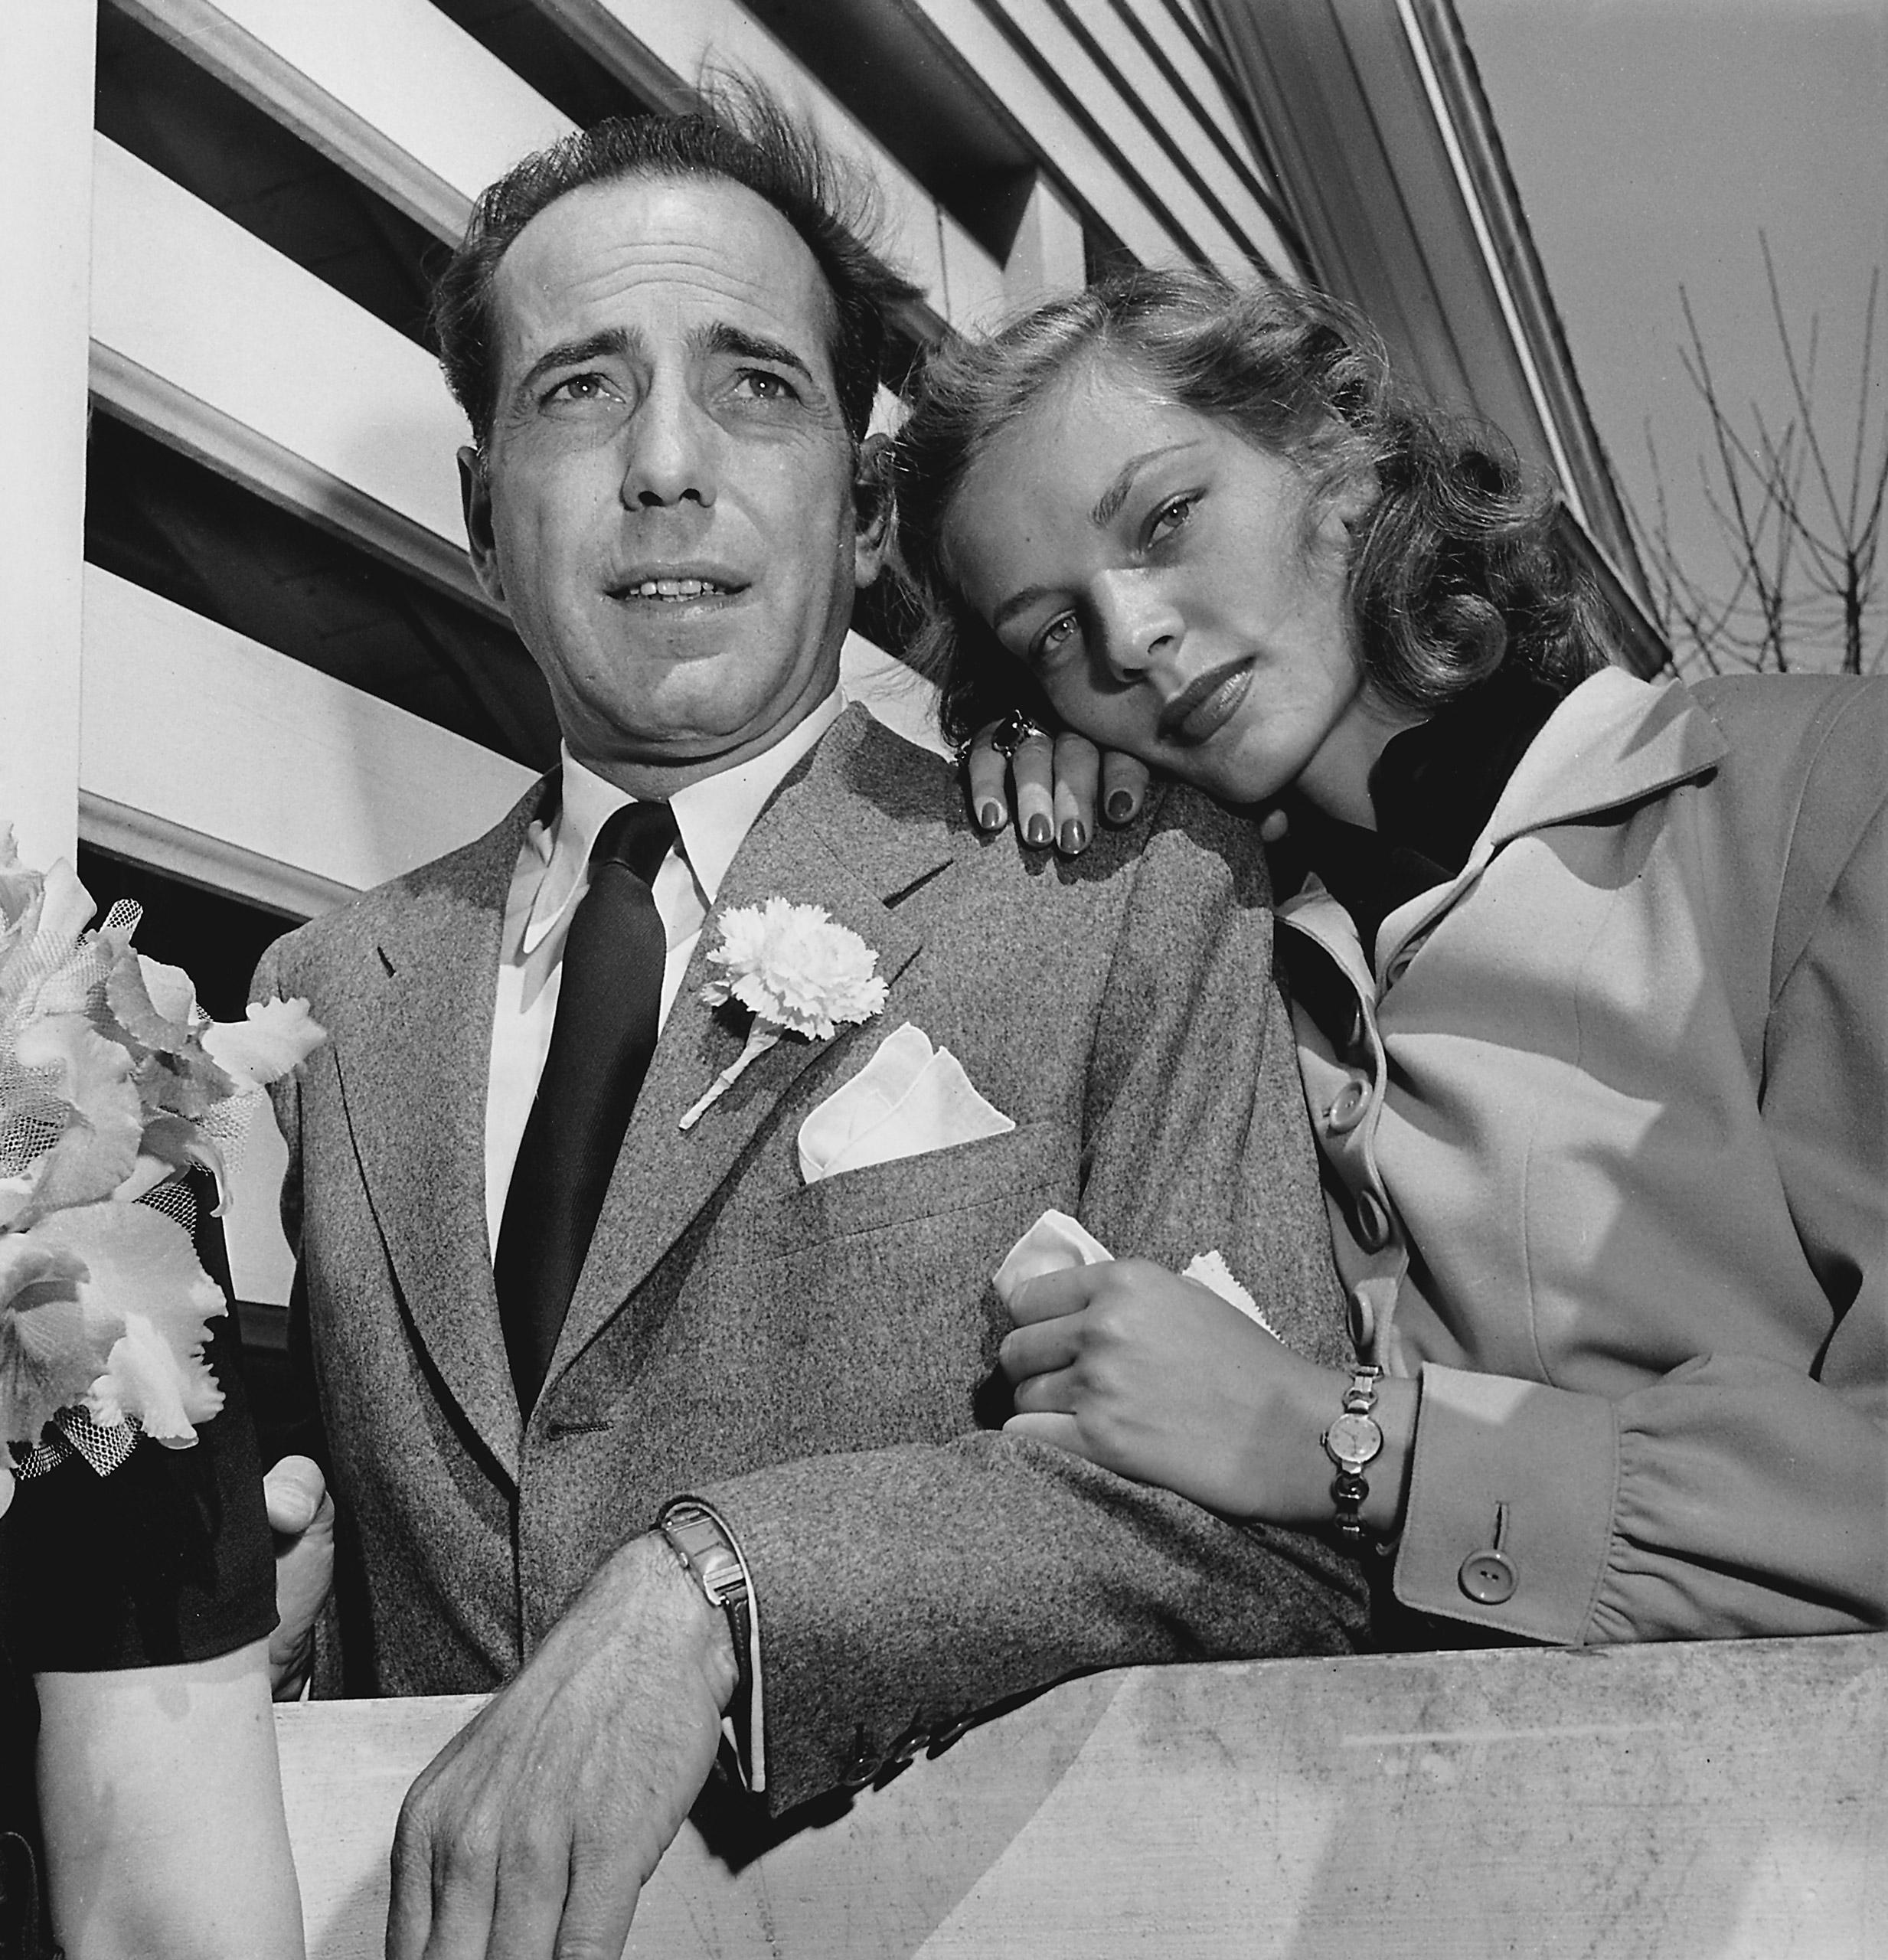 Newlywed actors Humphrey Bogart and Lauren Bacall attending wedding reception at the home of novelist Louis Bromfield.